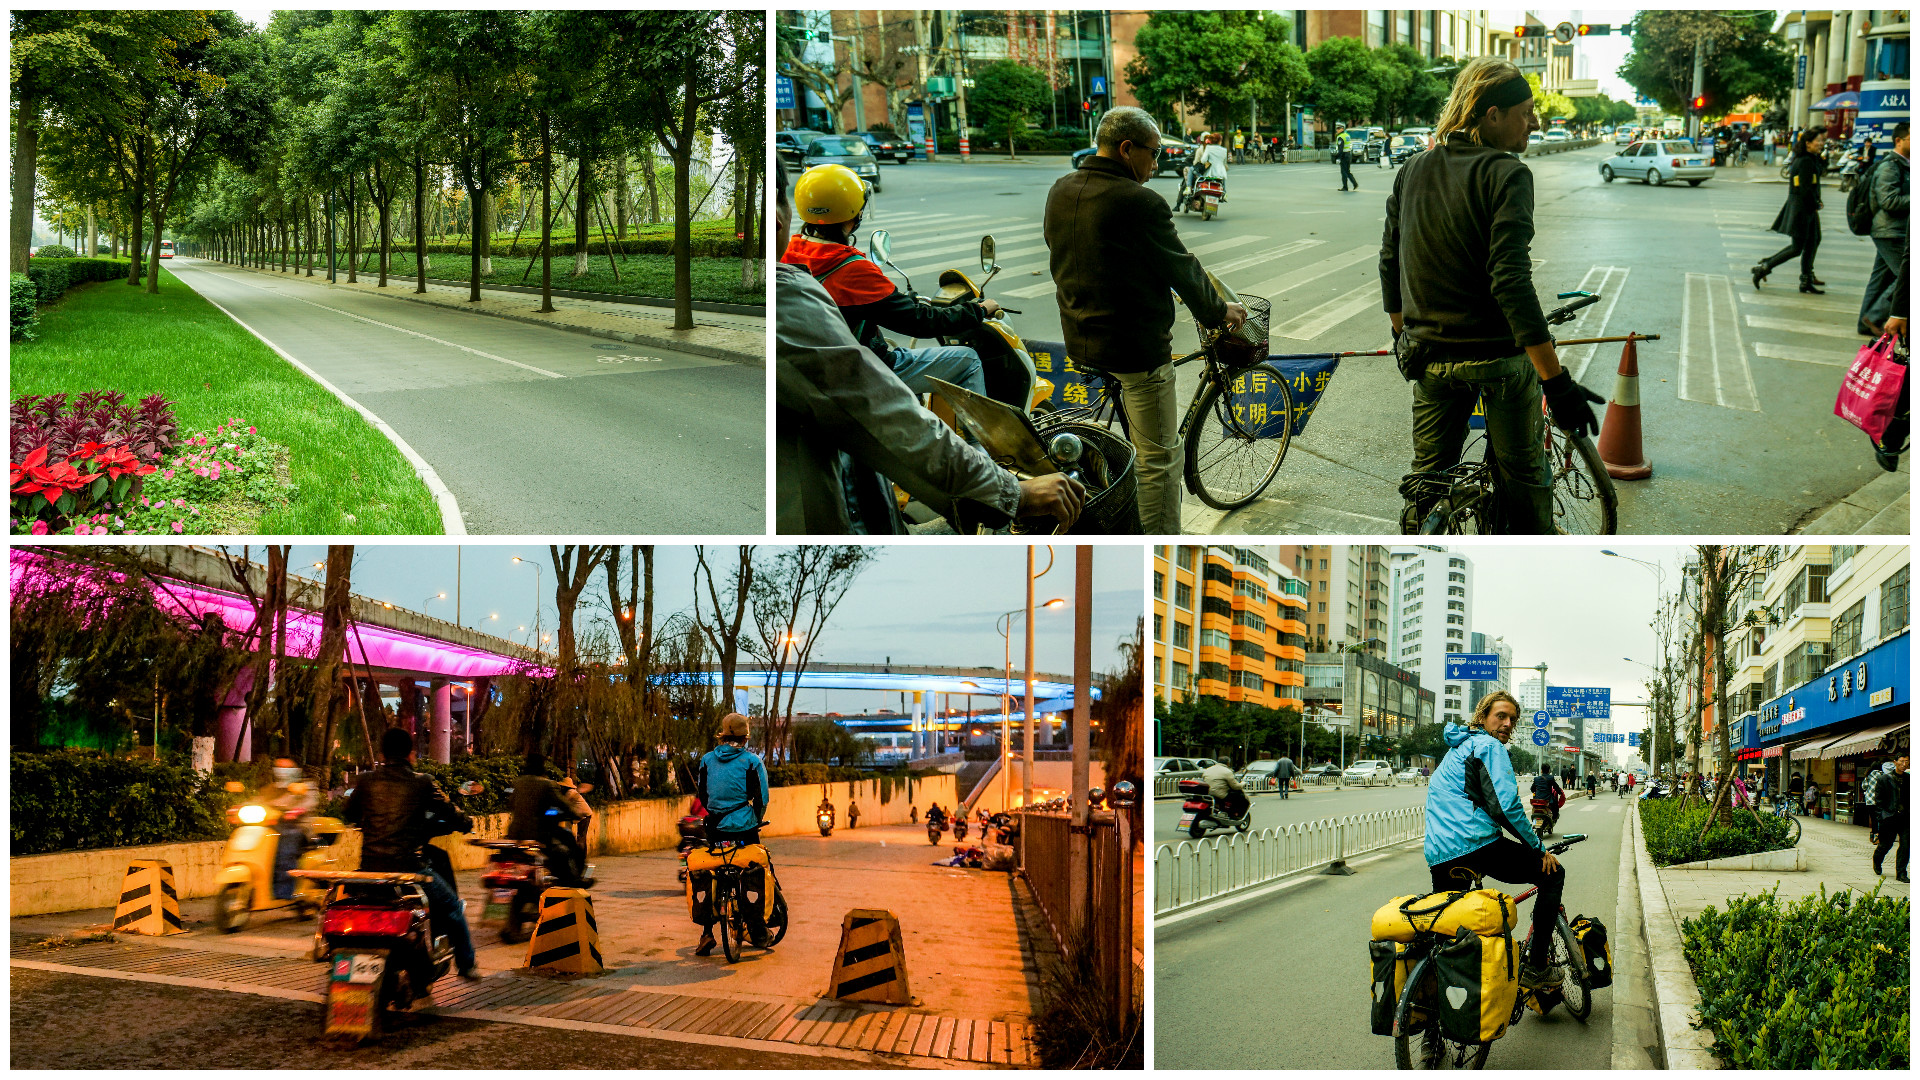 chiny-rowerowe-miasta